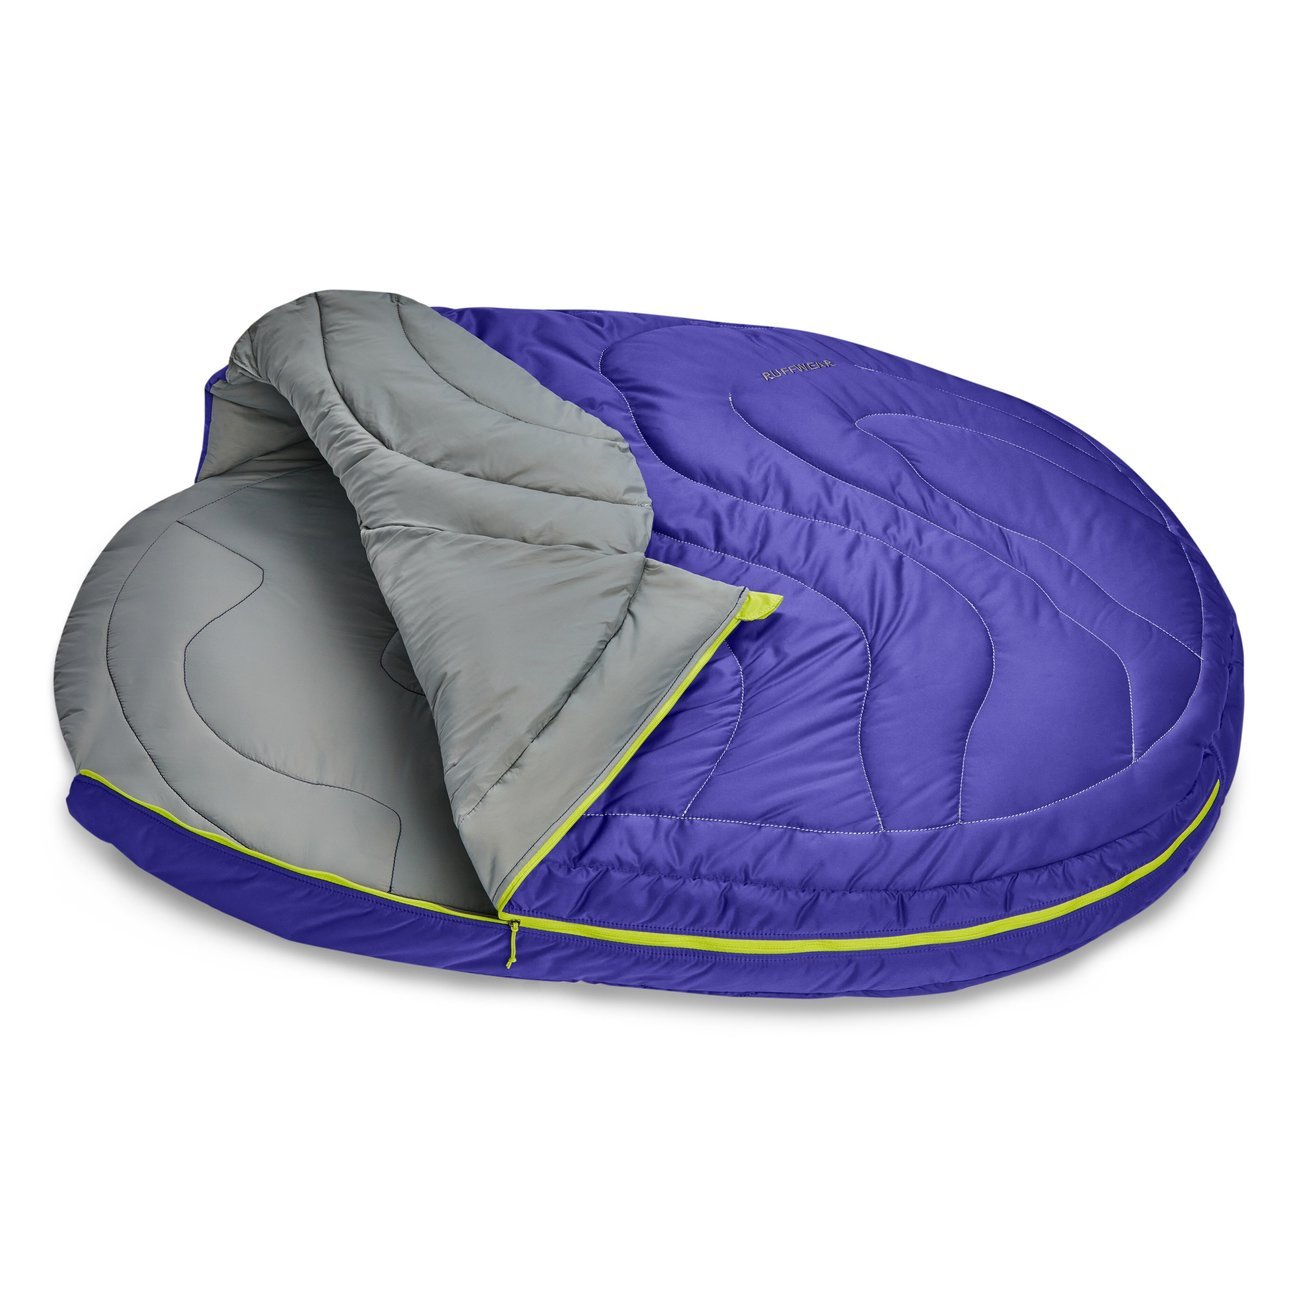 Ruffwear Highlands Sleeping Bag™ Schlafsack für Hunde, Bild 13